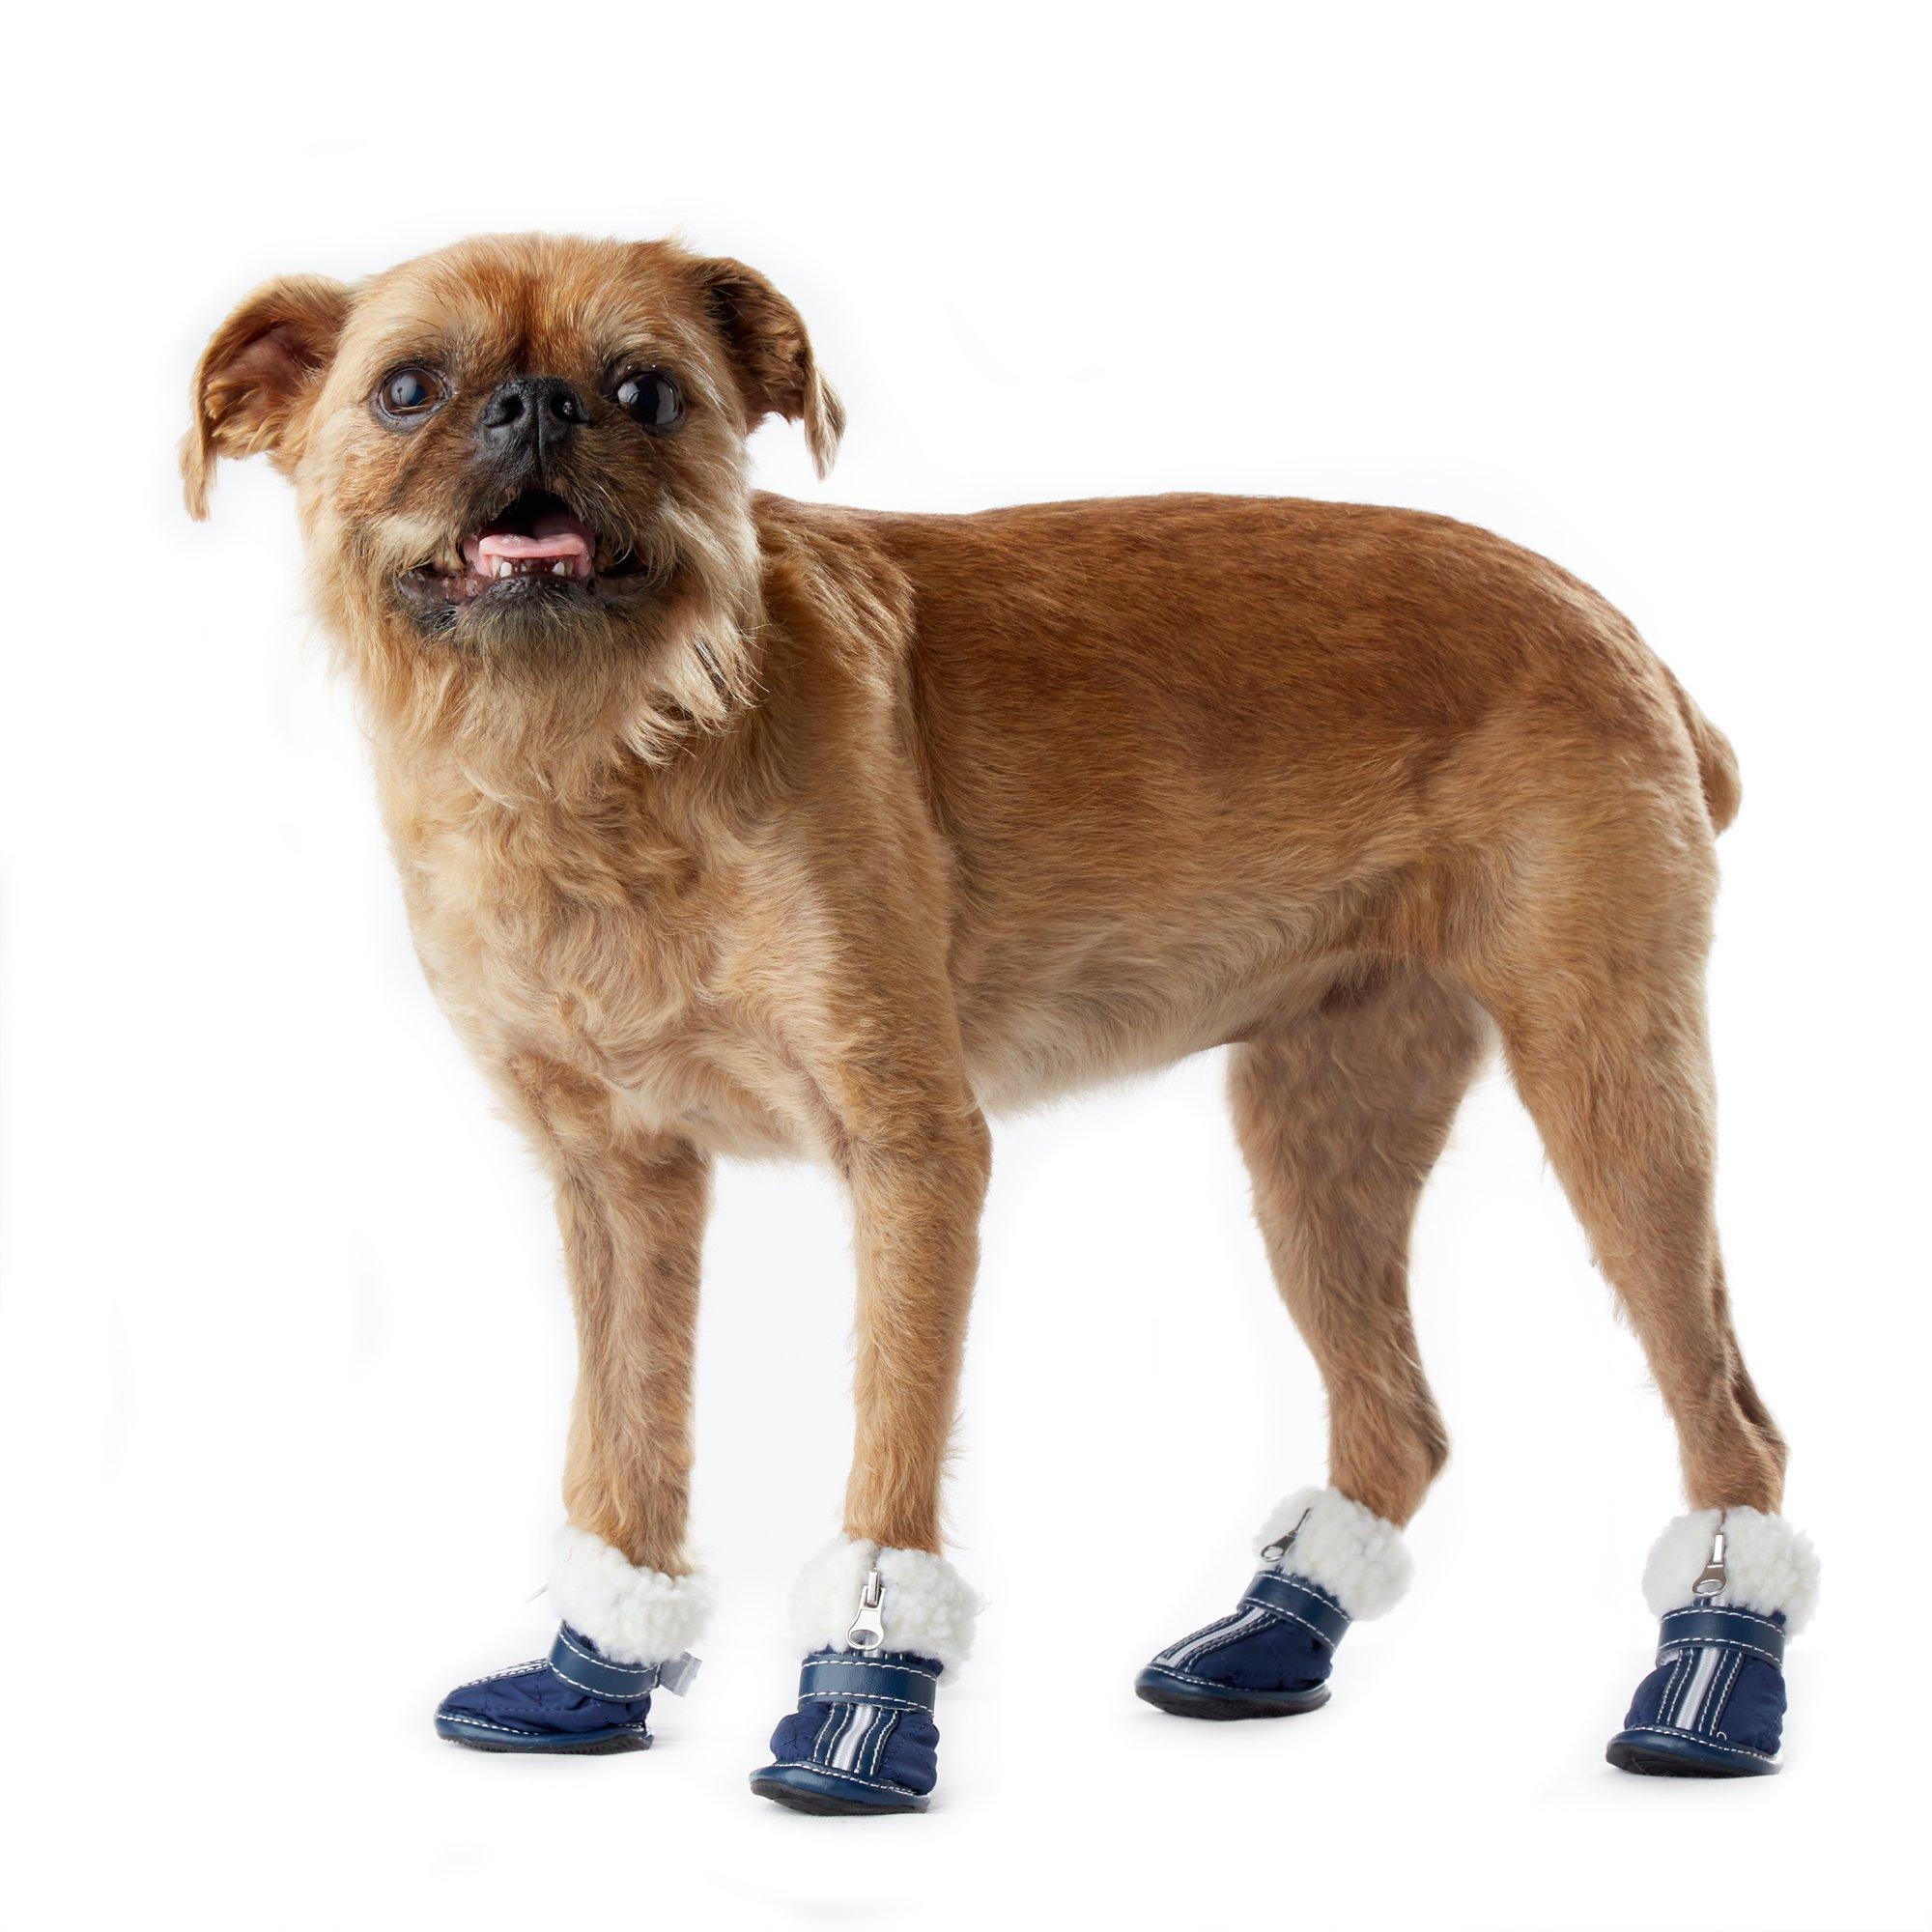 Pup Crew Navy Quilted Zip Shoes